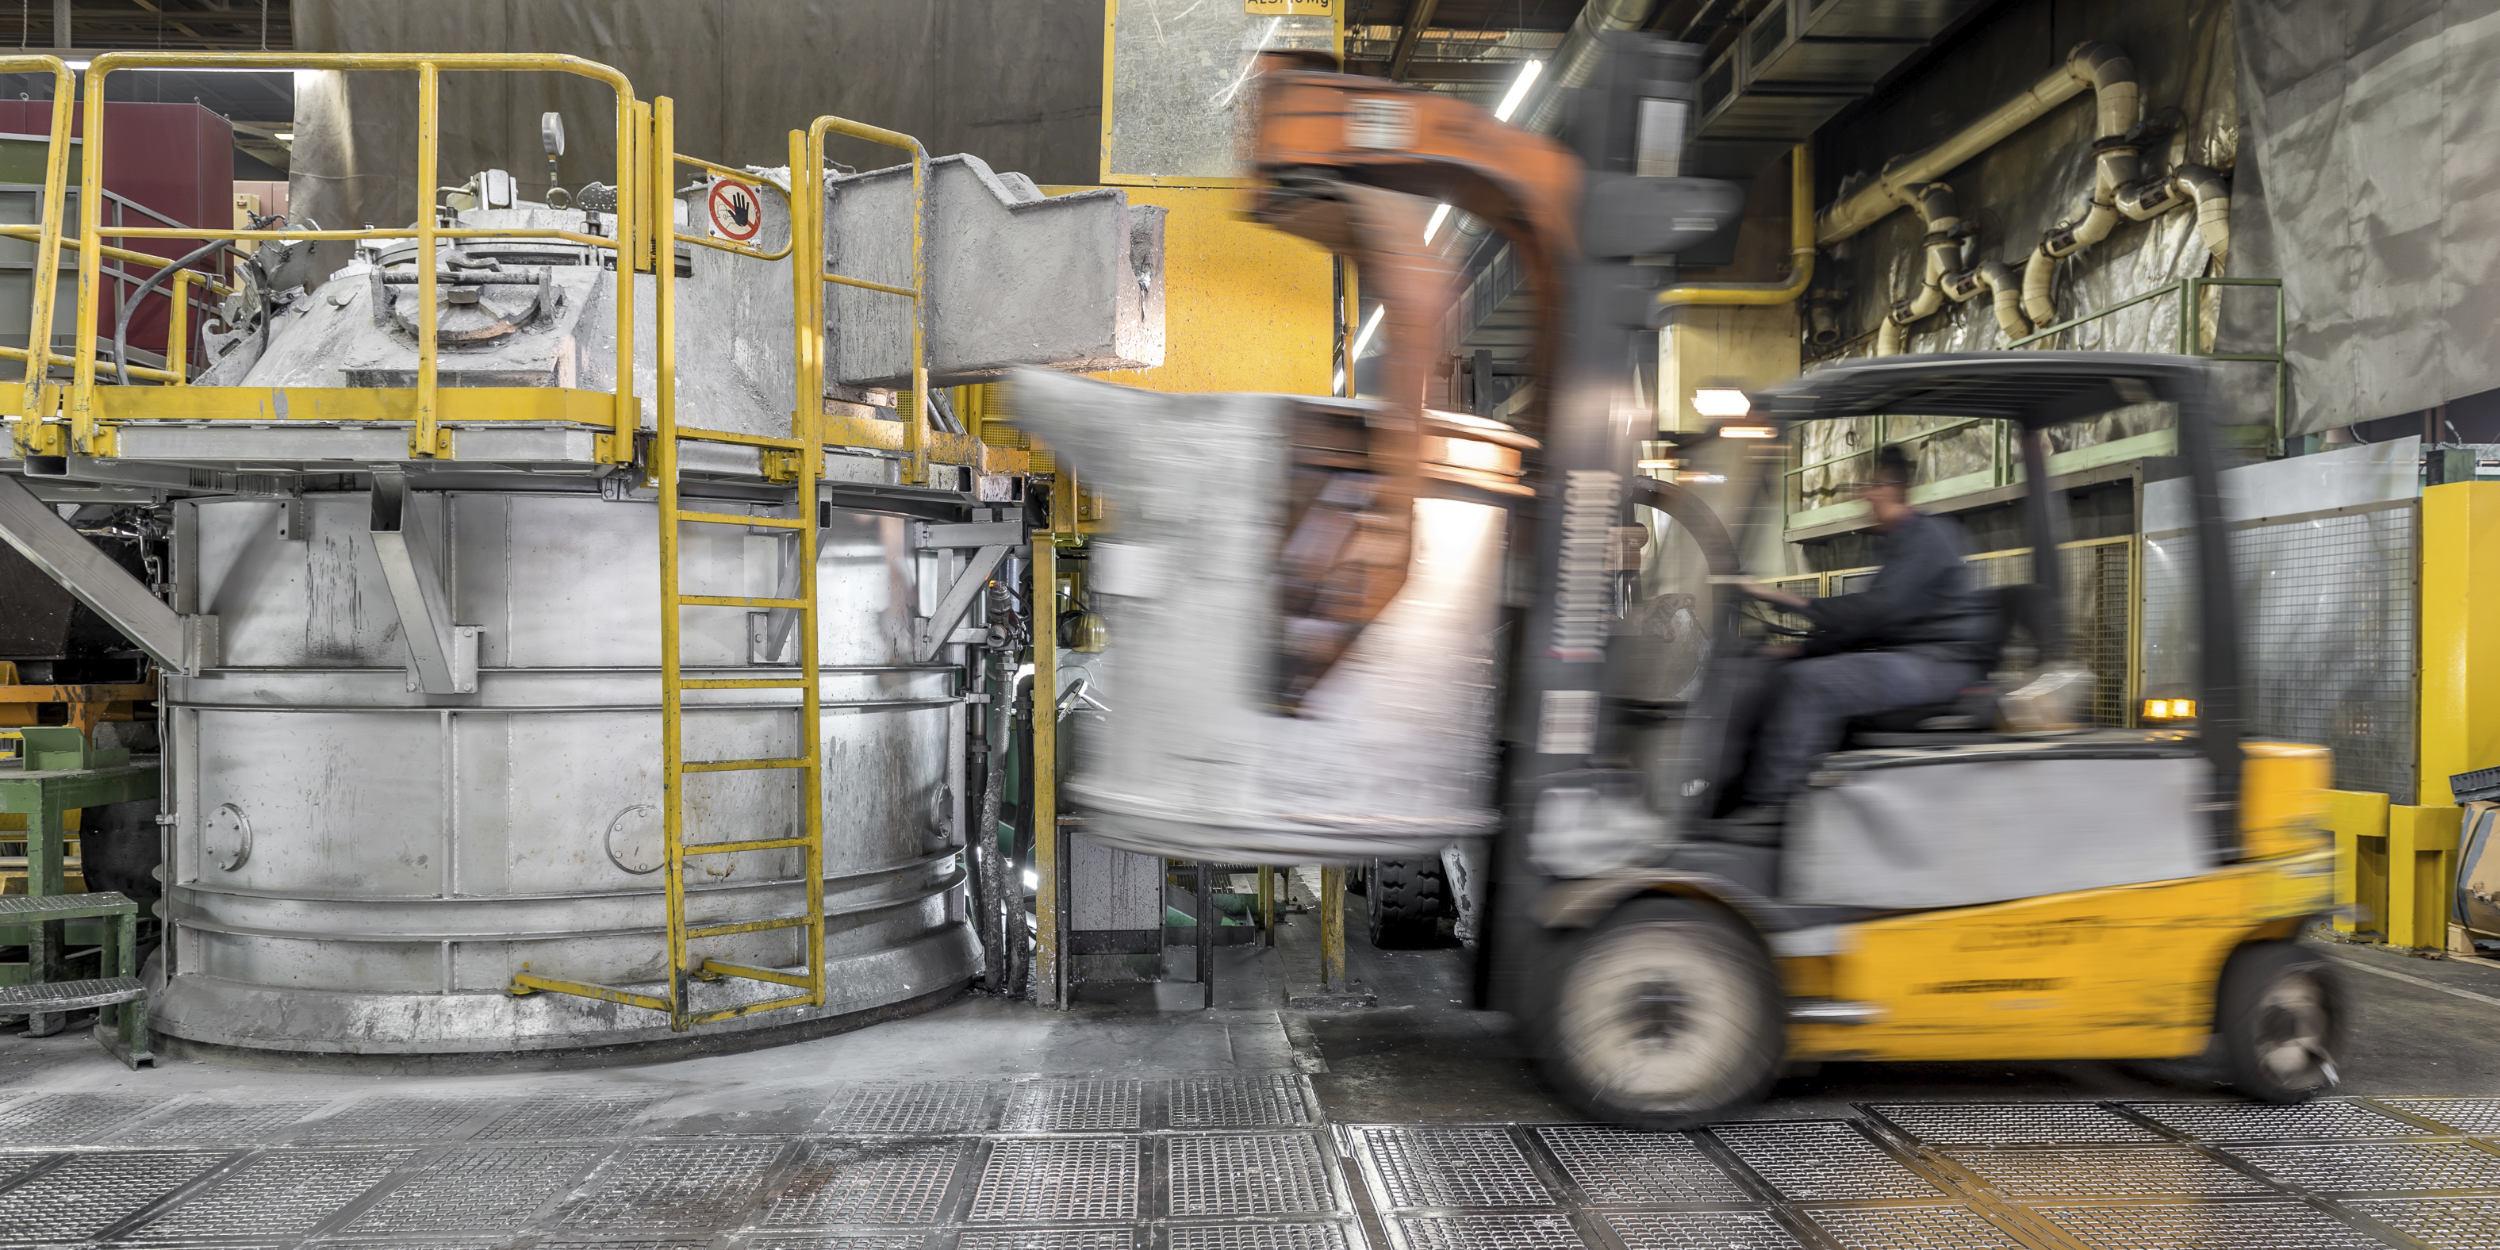 Industriefotografie Stuttgart und Umgebung Mercedes Benz Mettingen Aluminiumguss flüssiges Aluminium Vorsicht umgiessen Gabelstapler